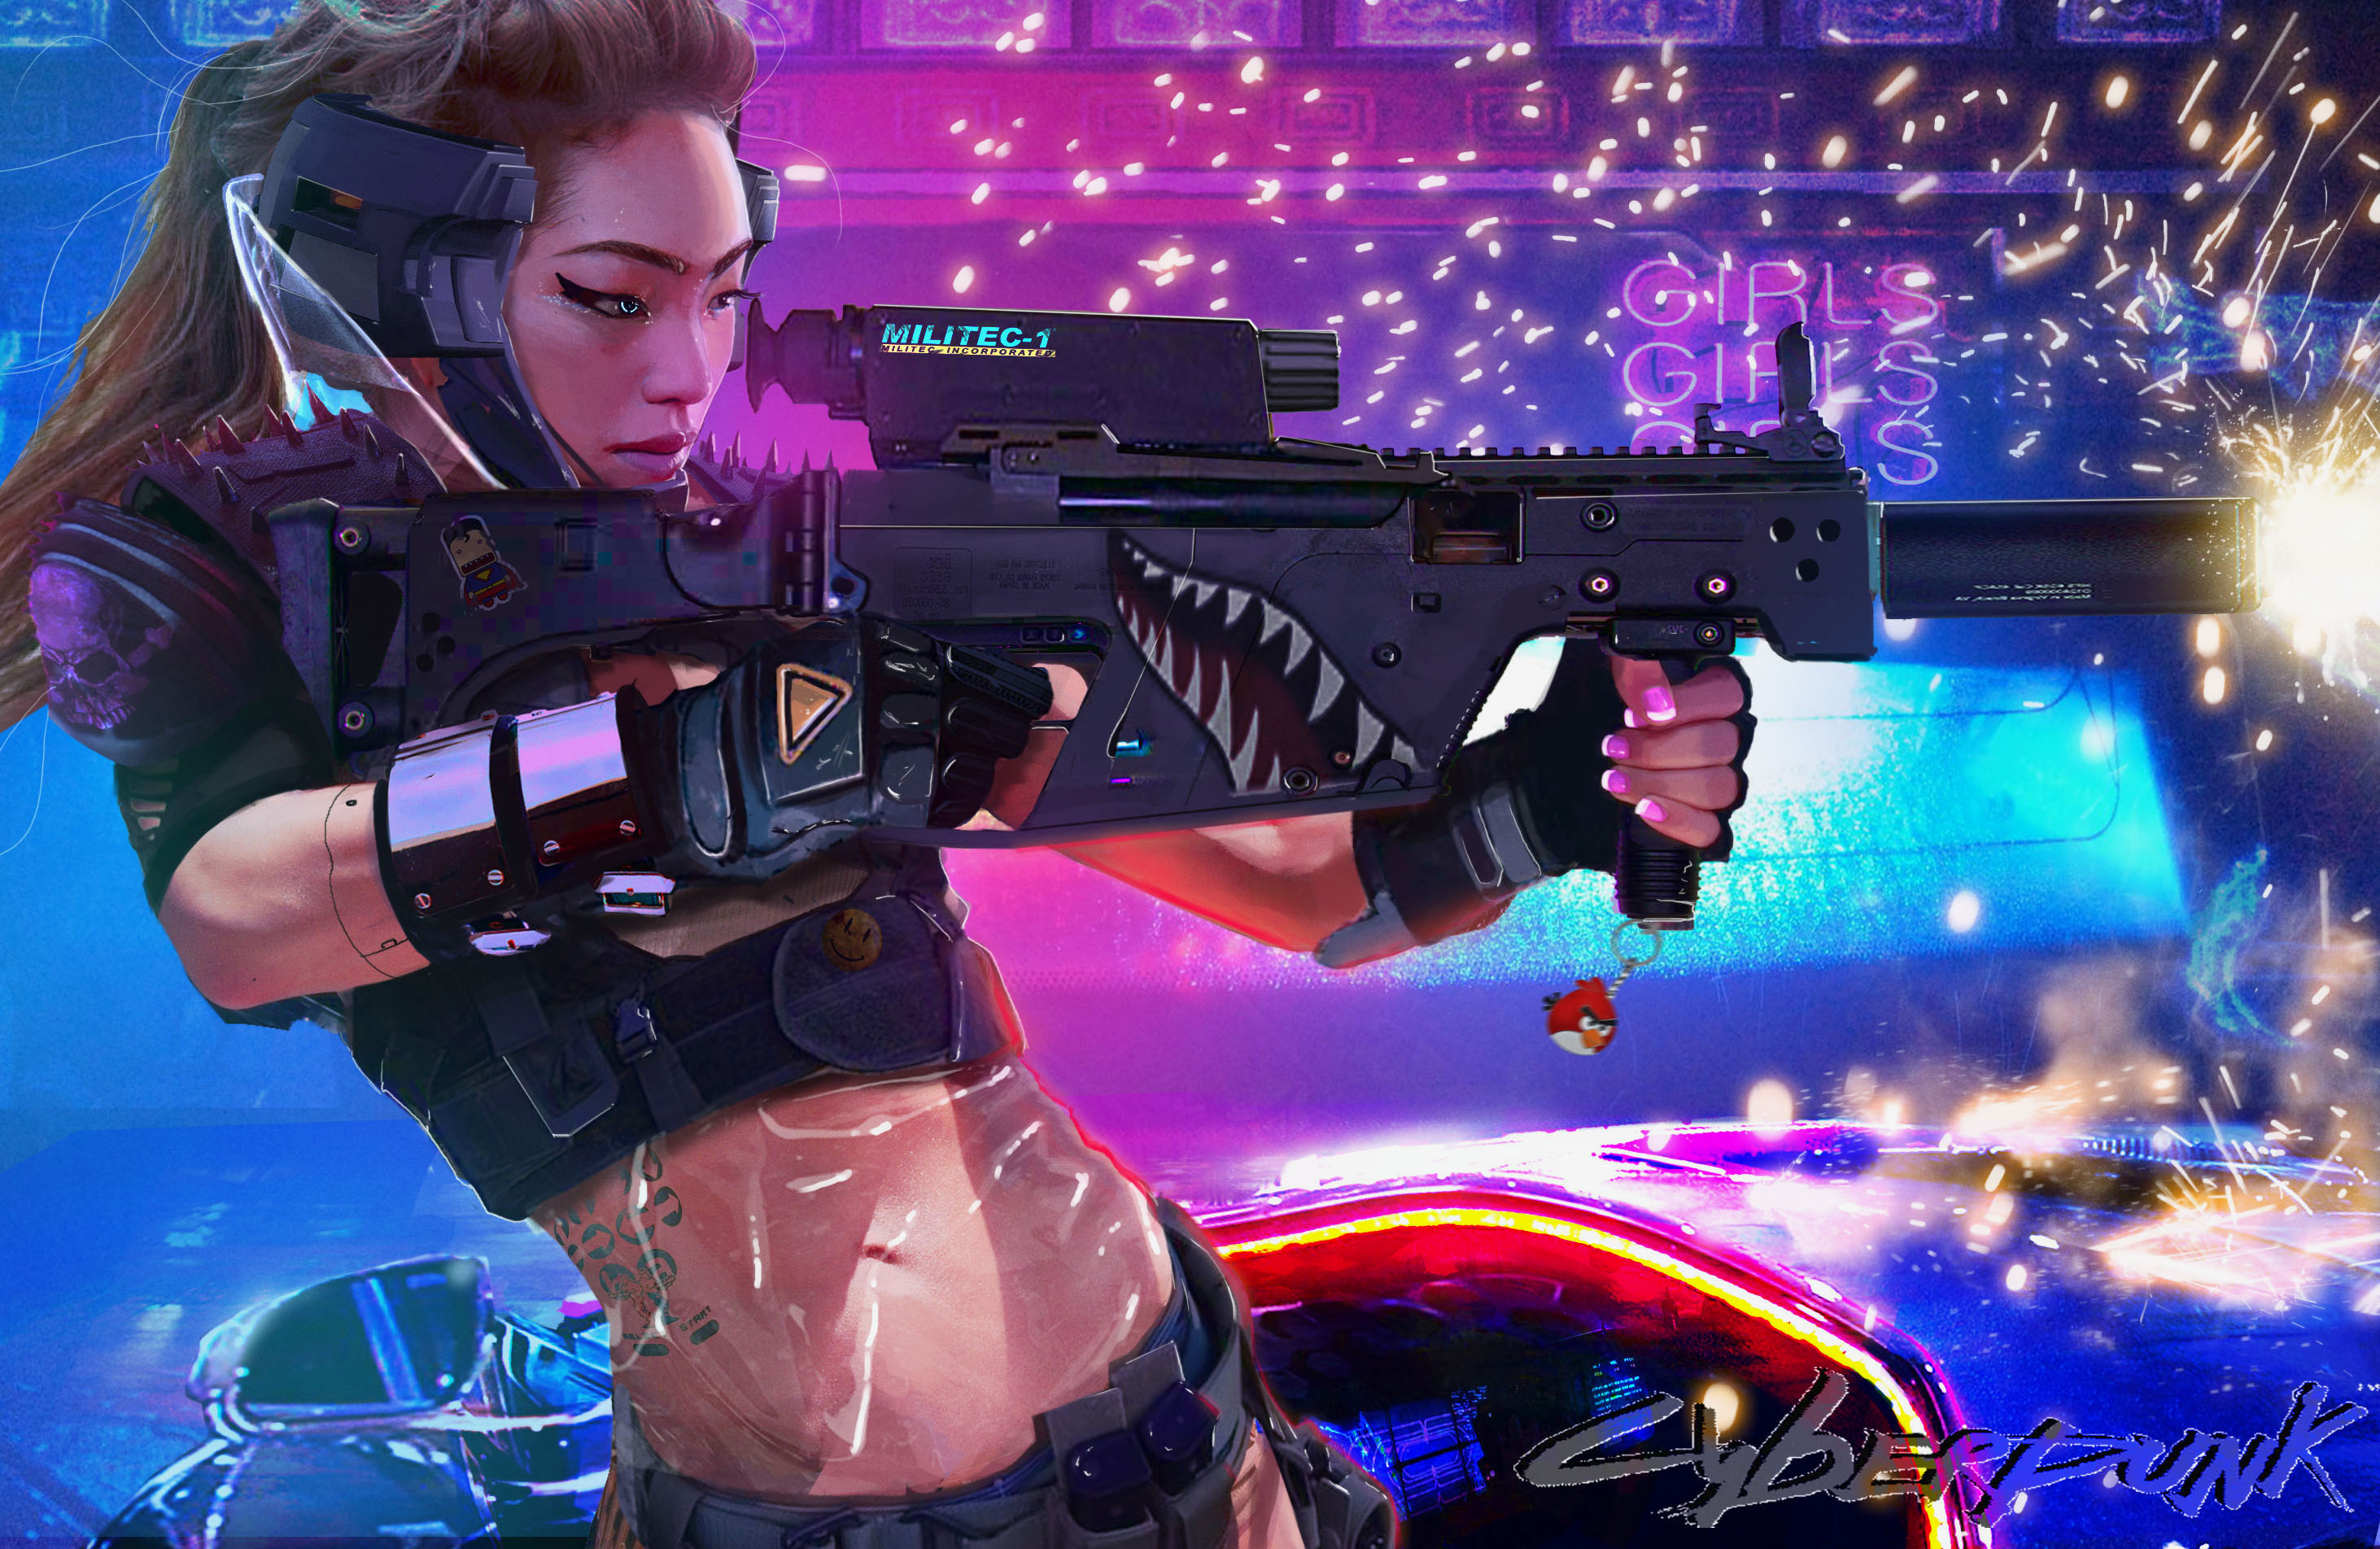 Ichiko Harada - 407-2 Science-fiction-cyberpunk-xp